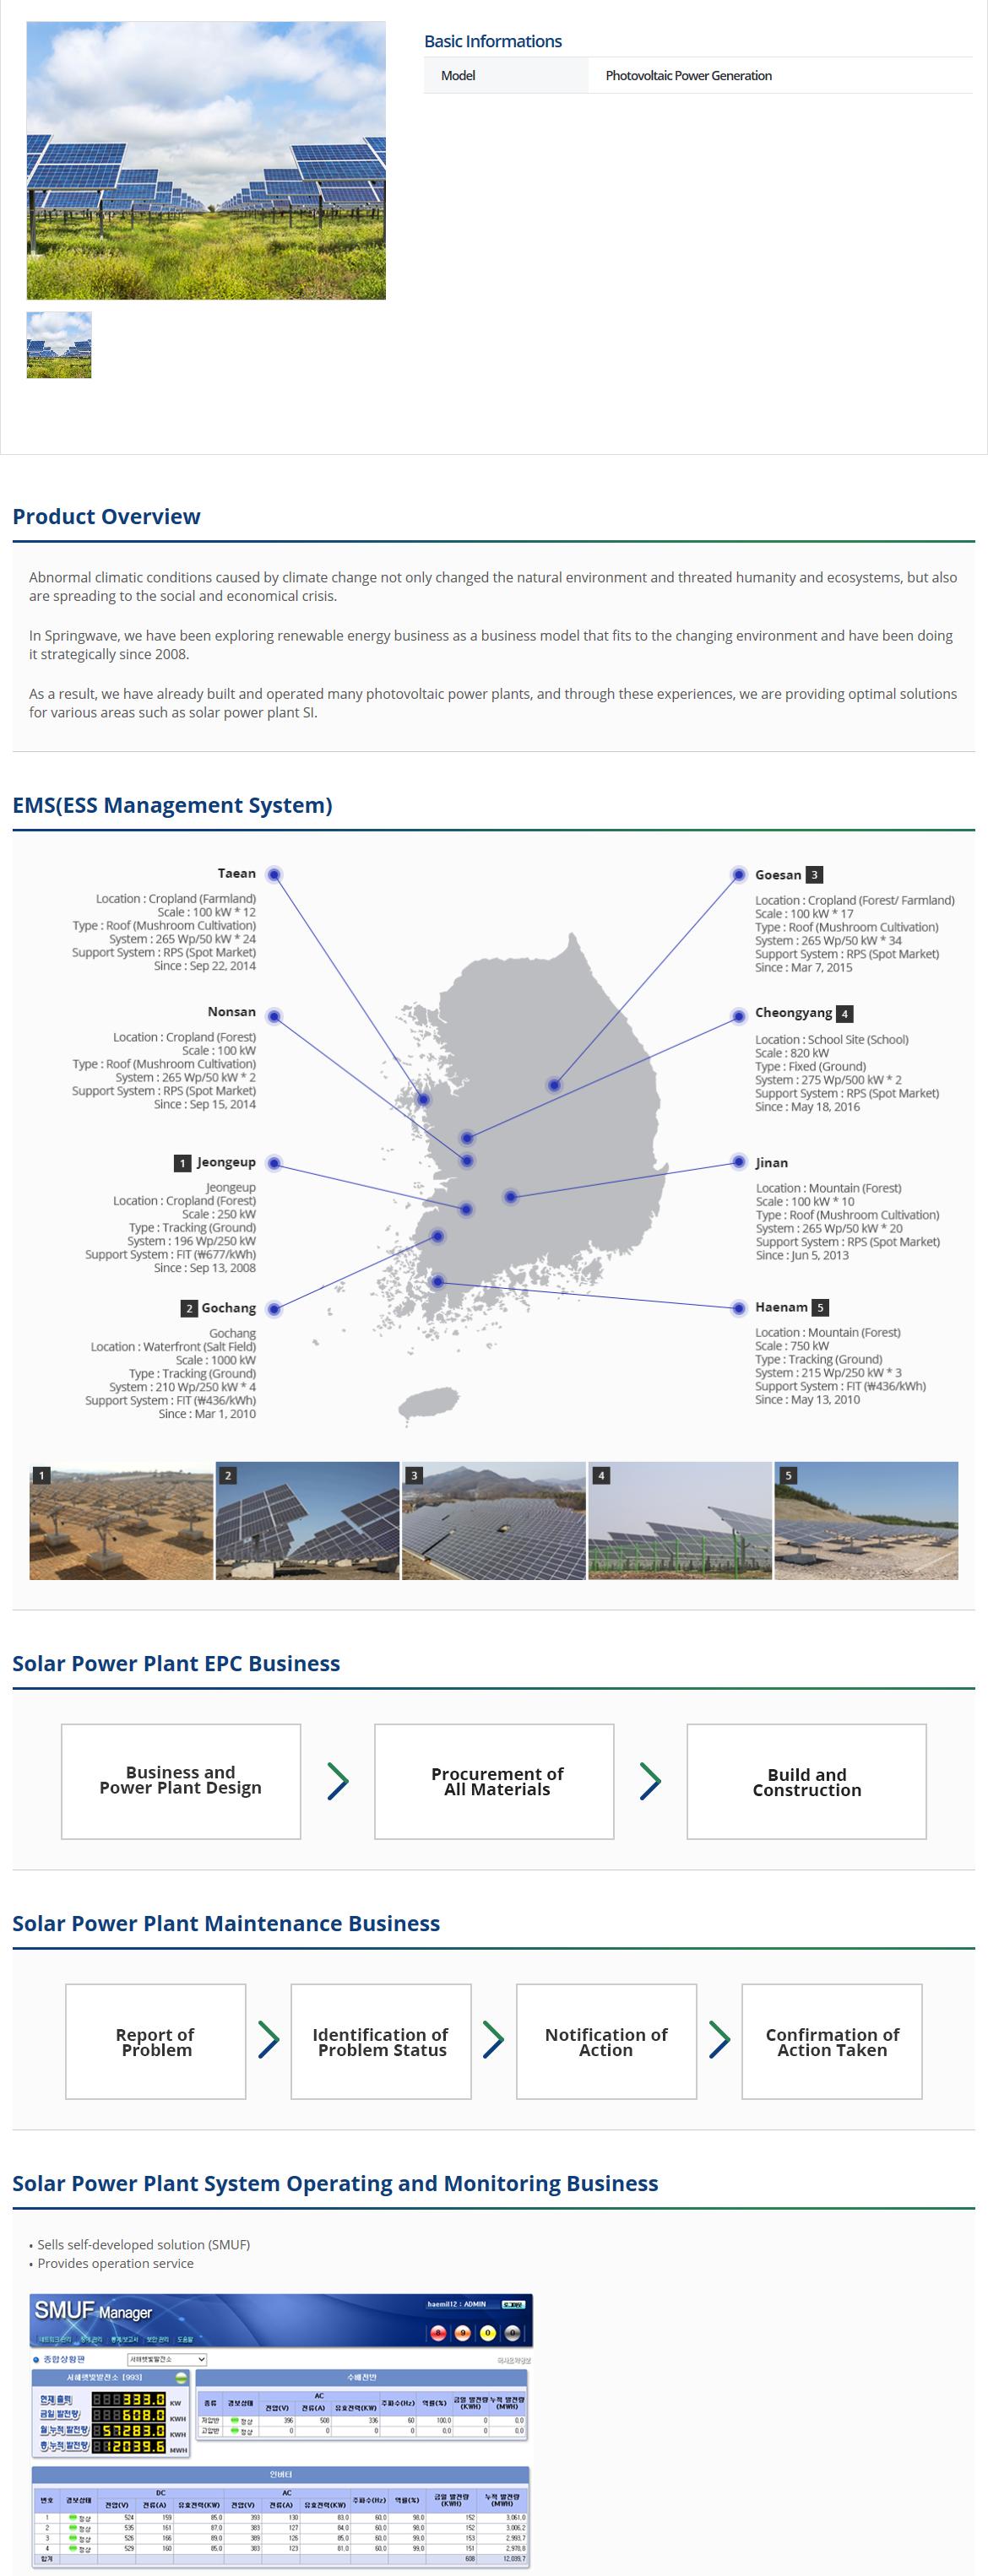 Spring Wave Information & Telecom Photovoltaic Power Generation